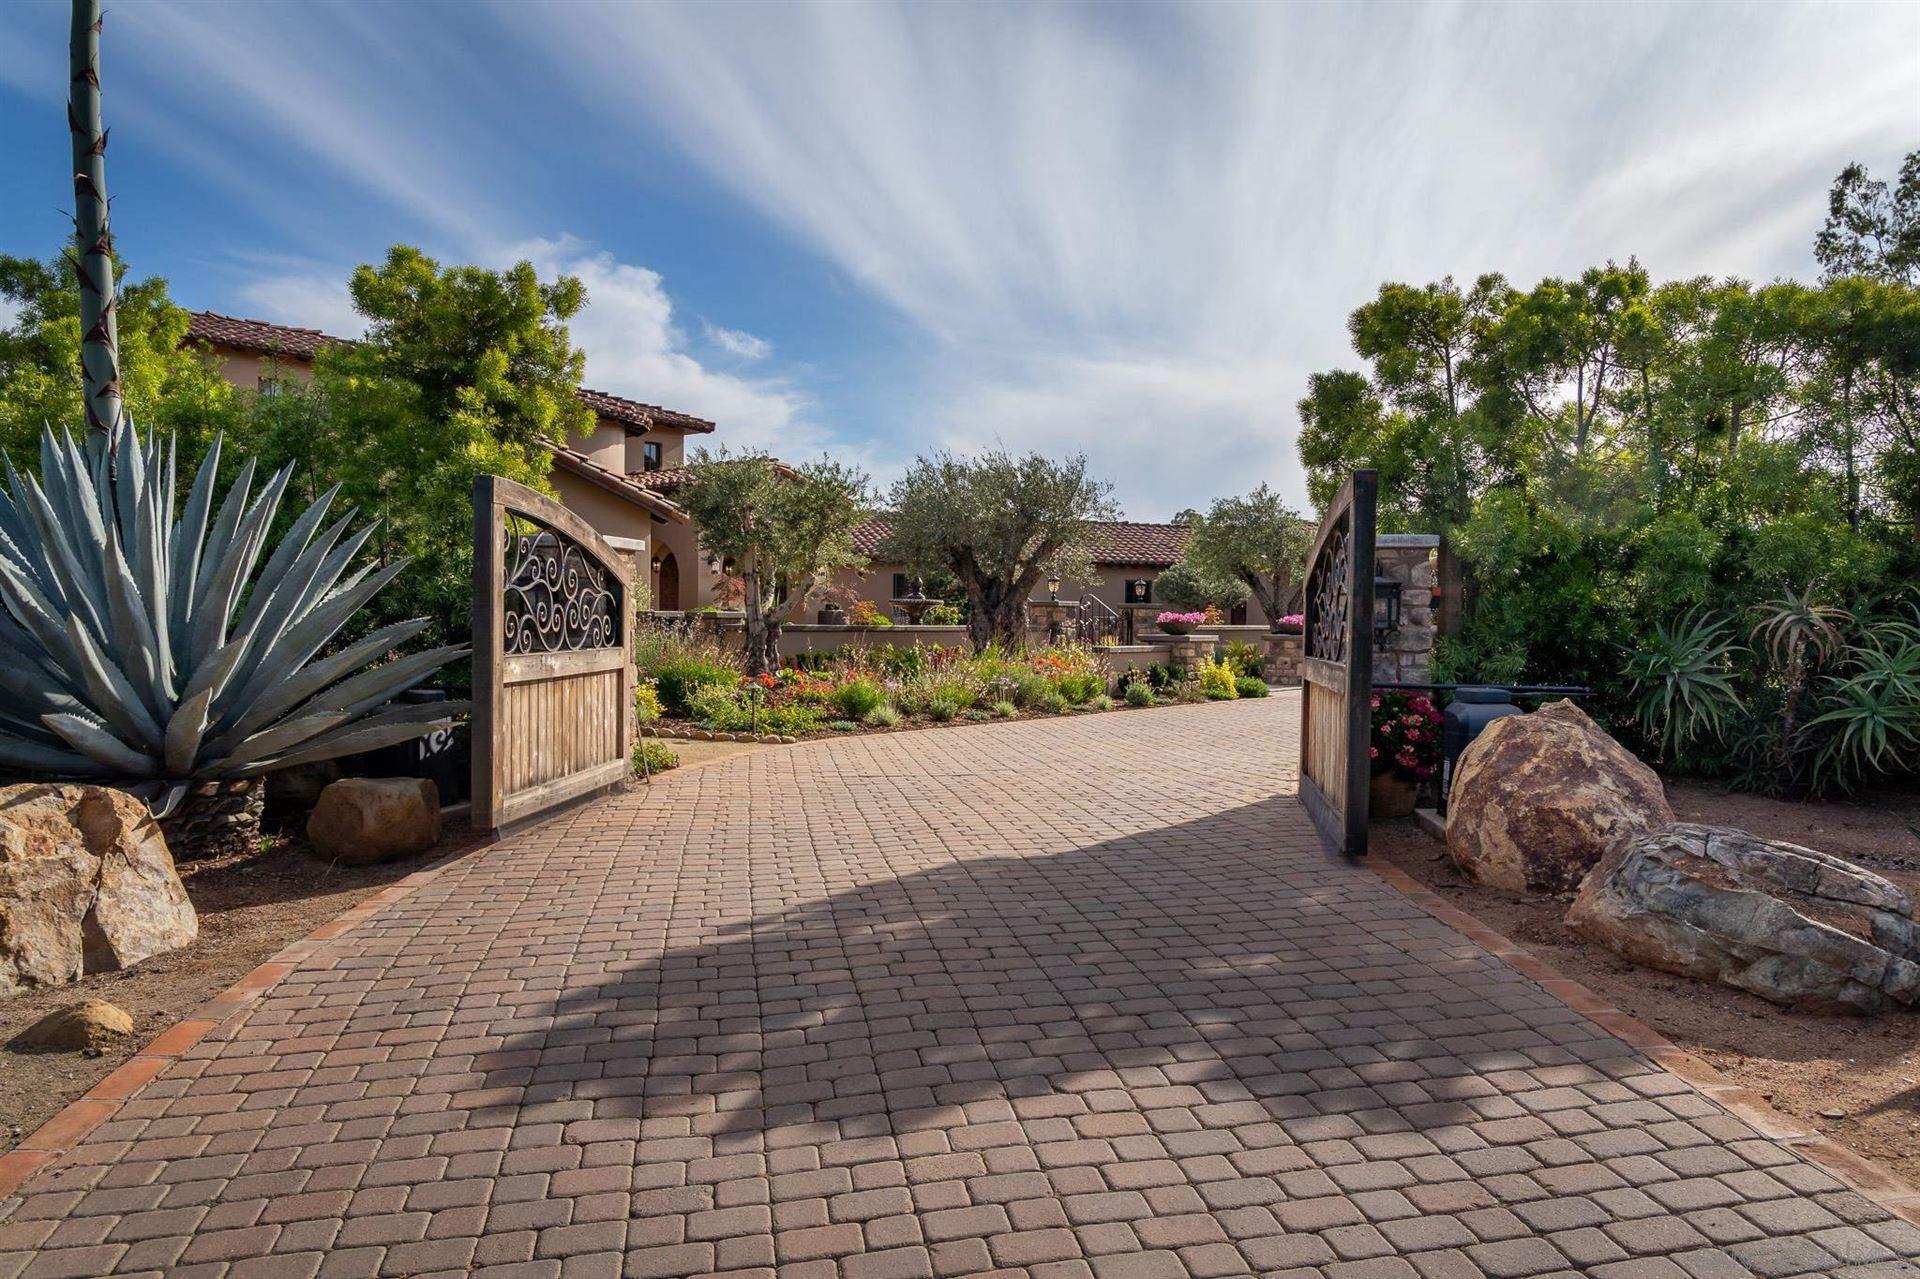 Photo of 16738 Zumaque, Rancho Santa Fe, CA 92067 (MLS # 210014901)